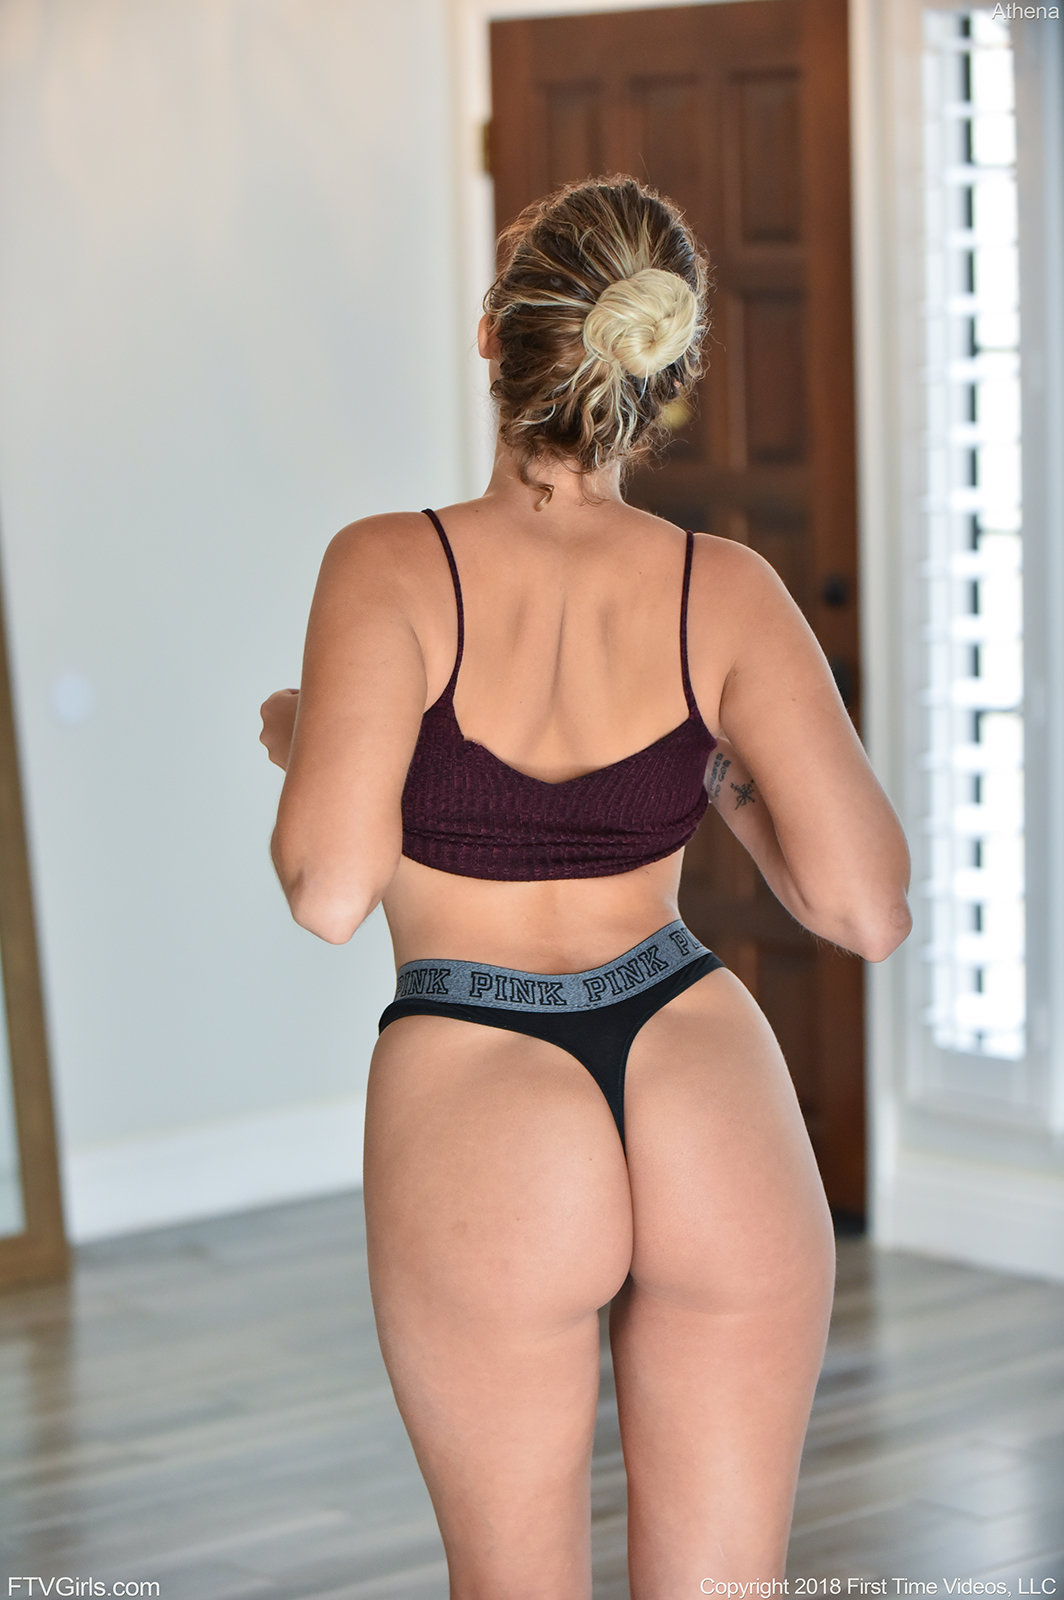 Miley cyrus sexy 56 pics gifs video advise